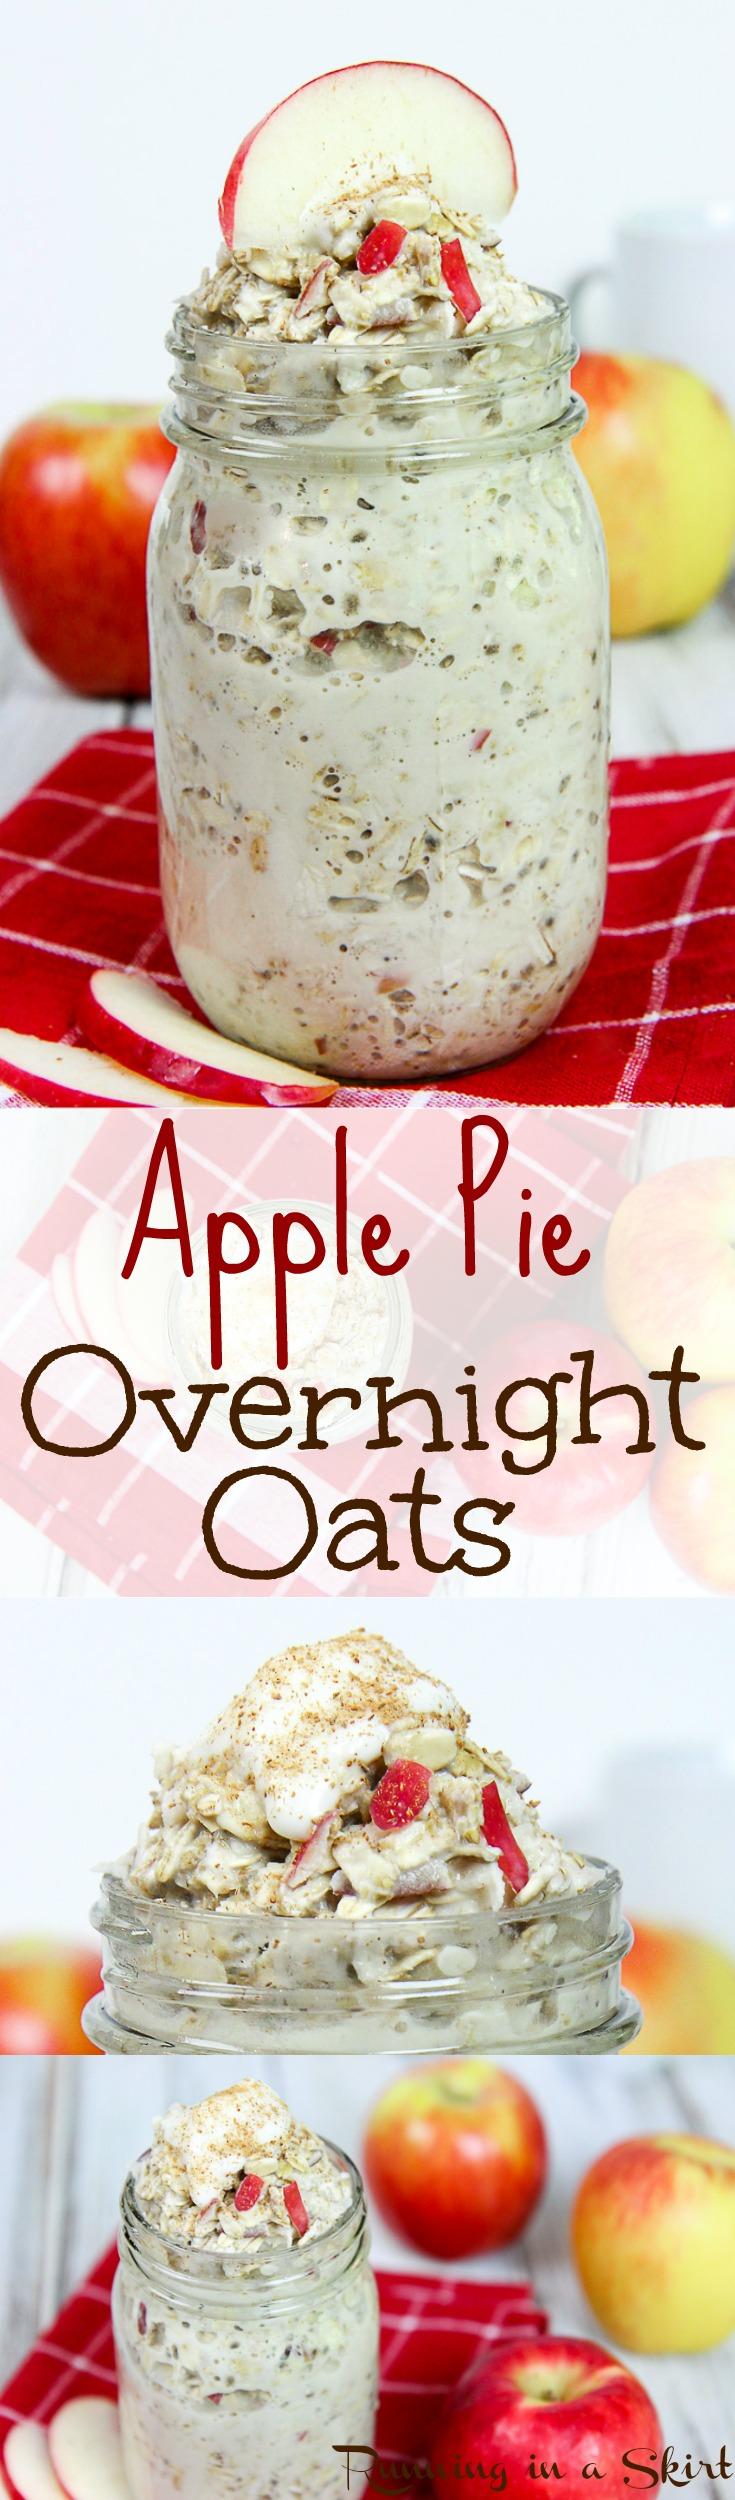 Healthy Apple Pie Overnight Oats